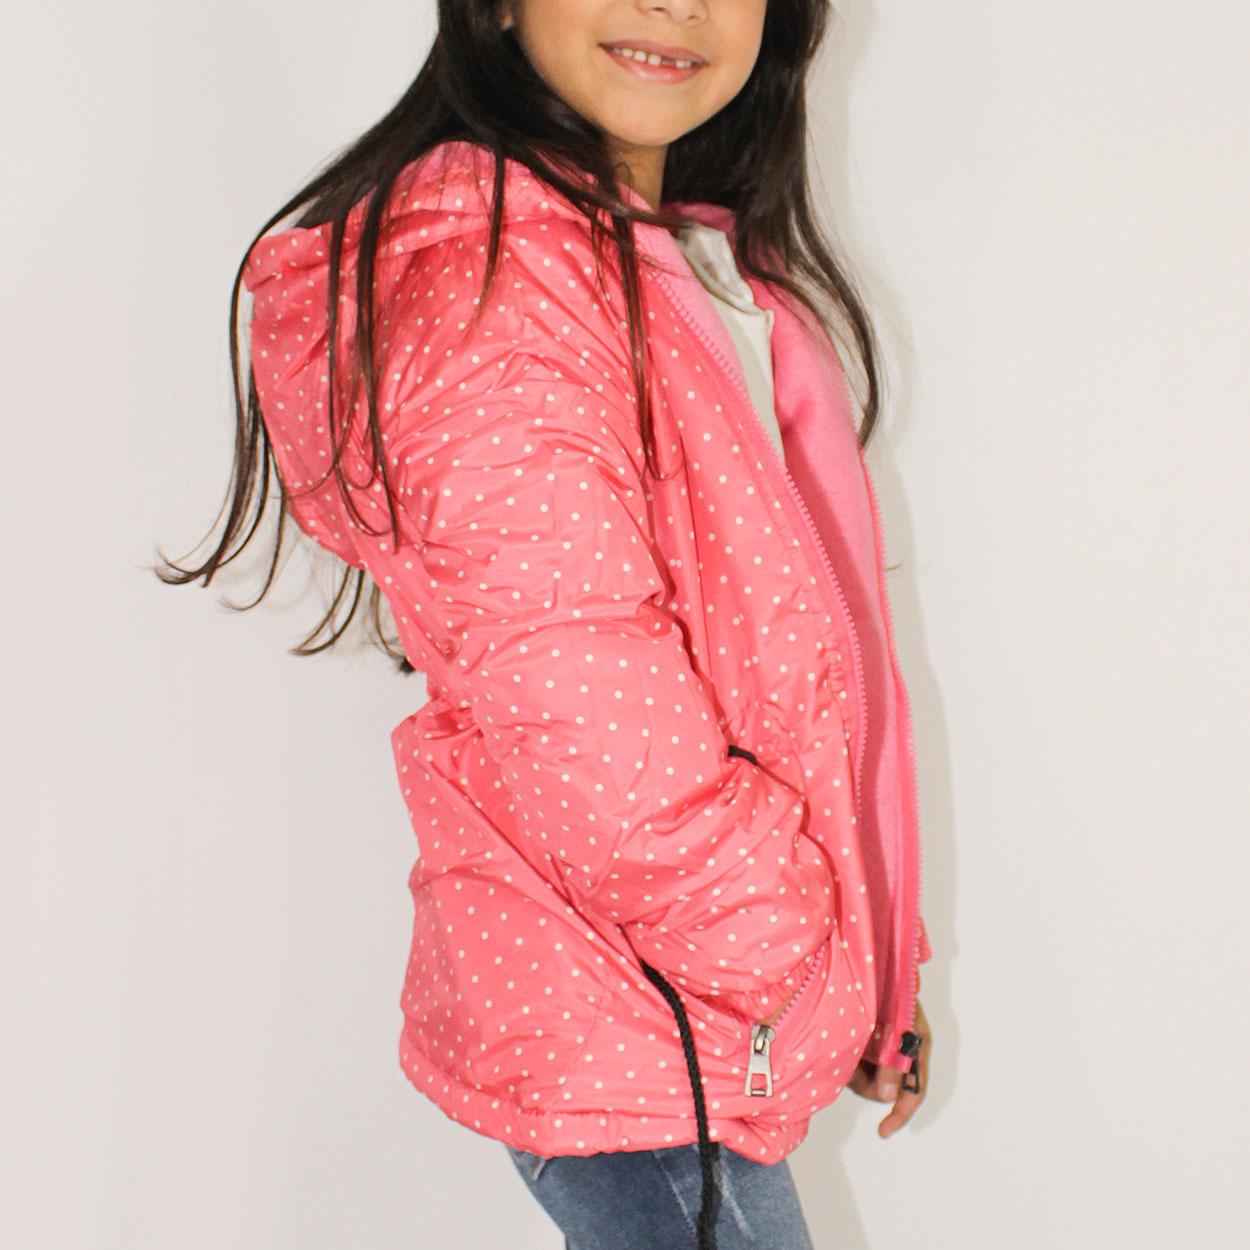 Parka Feminina Infantil em Nylon